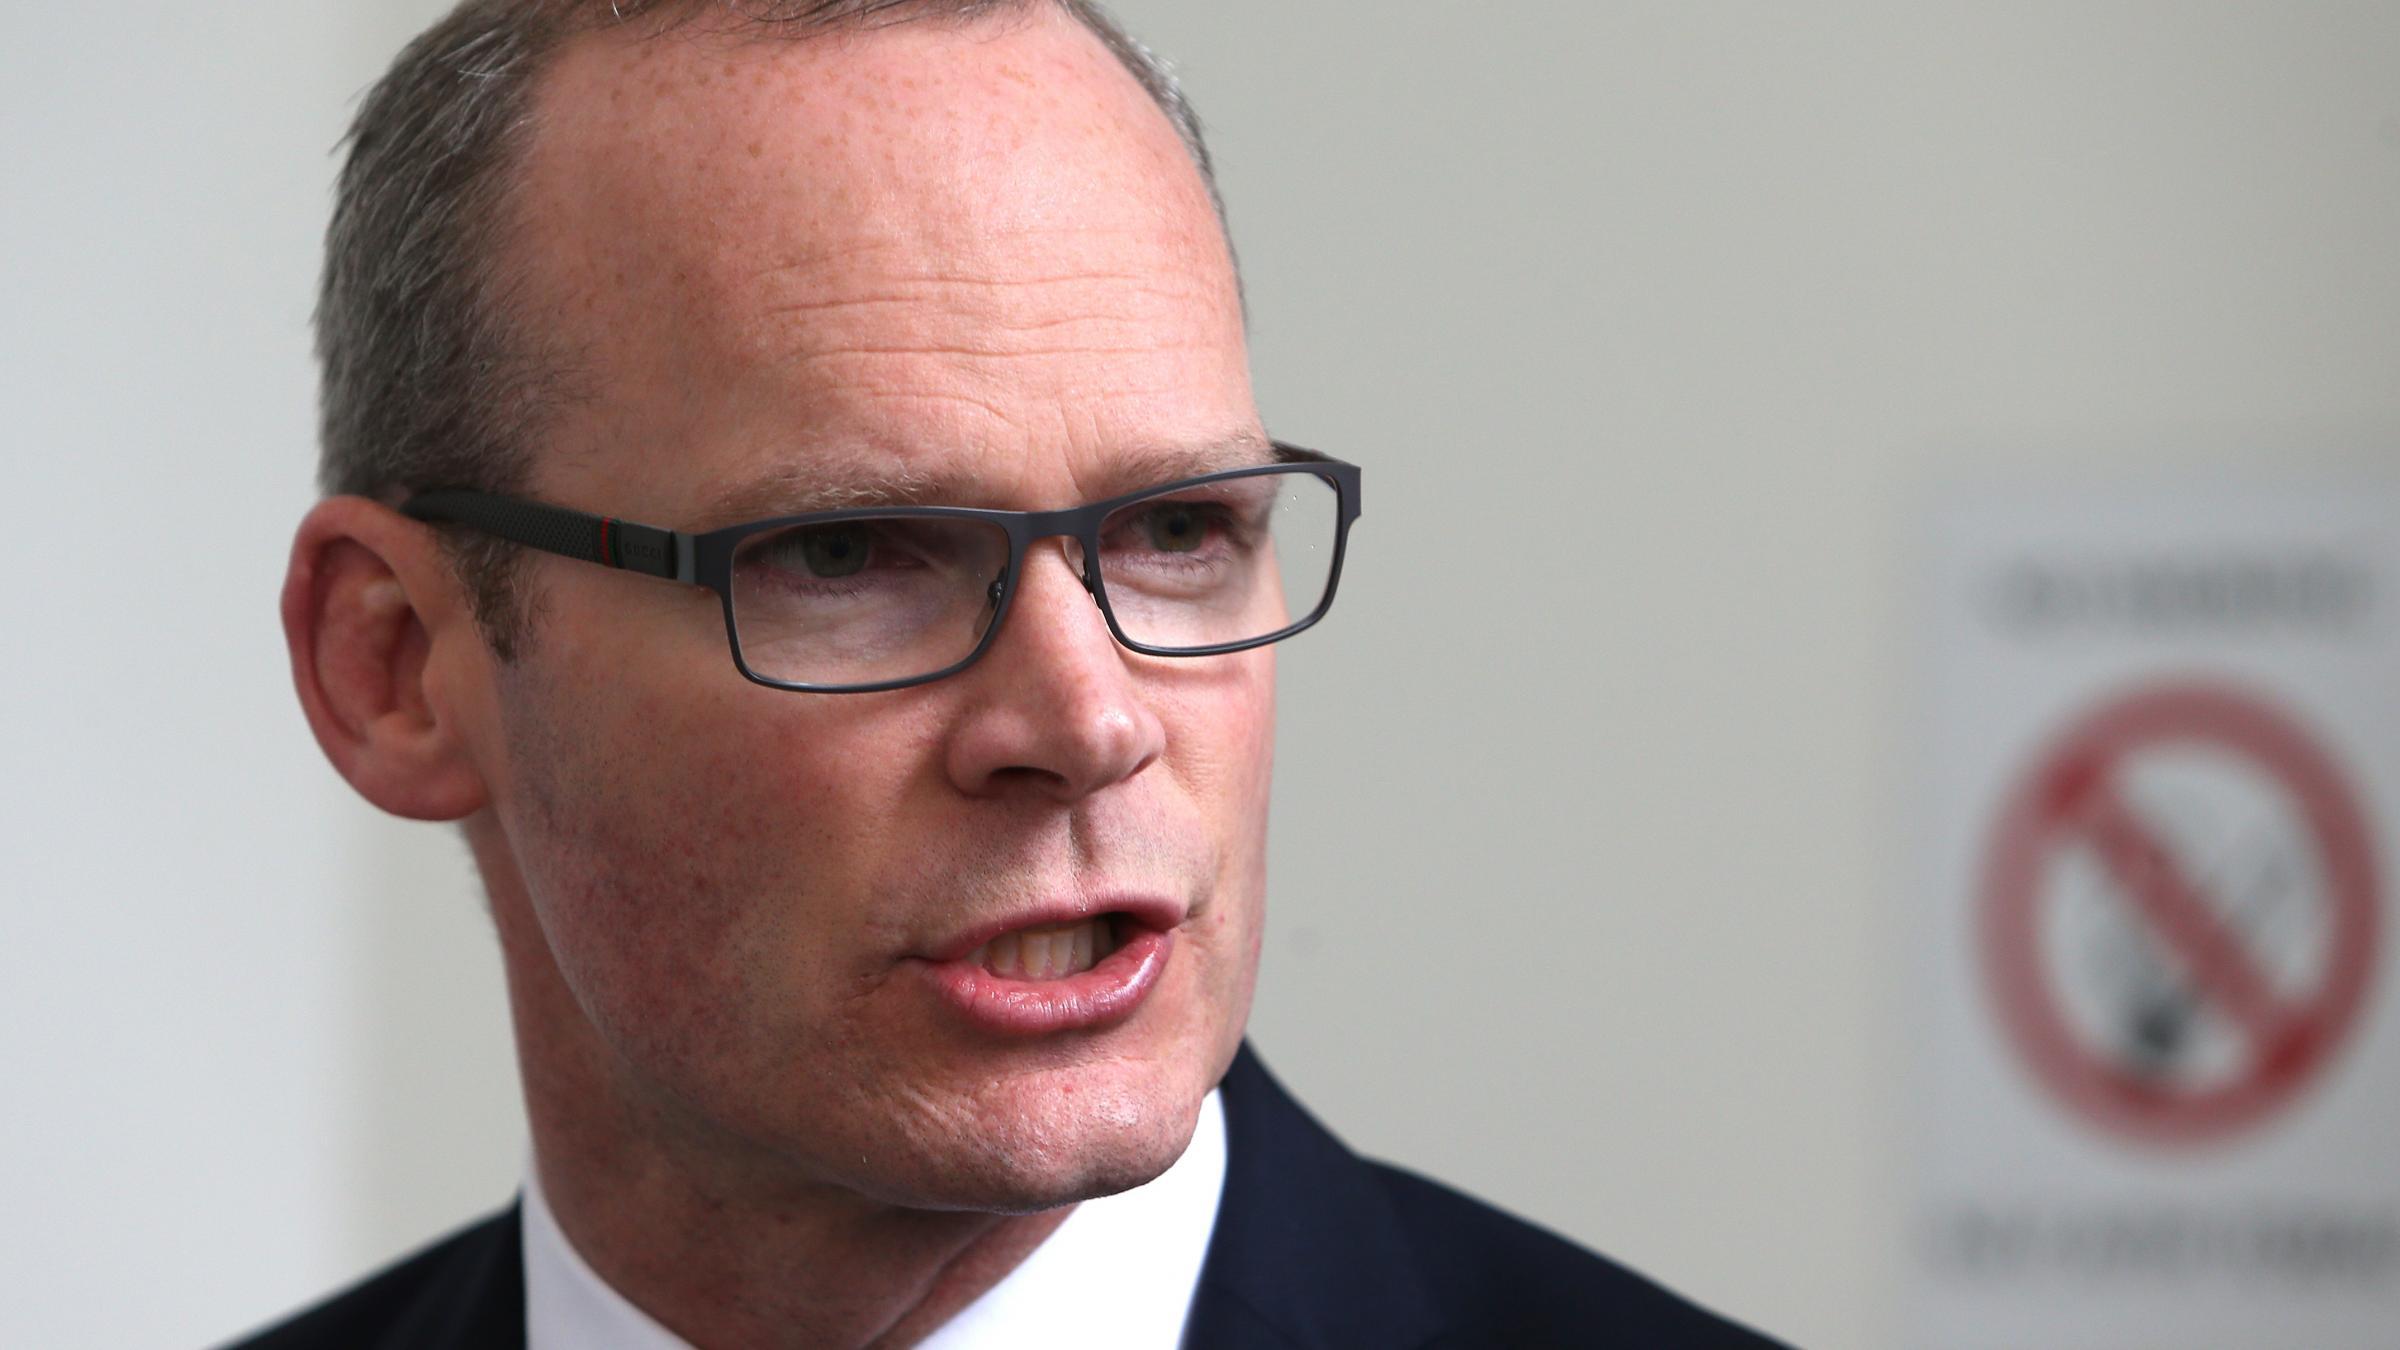 Ireland's Varadkar says reassured by UK PM May over DUP deal